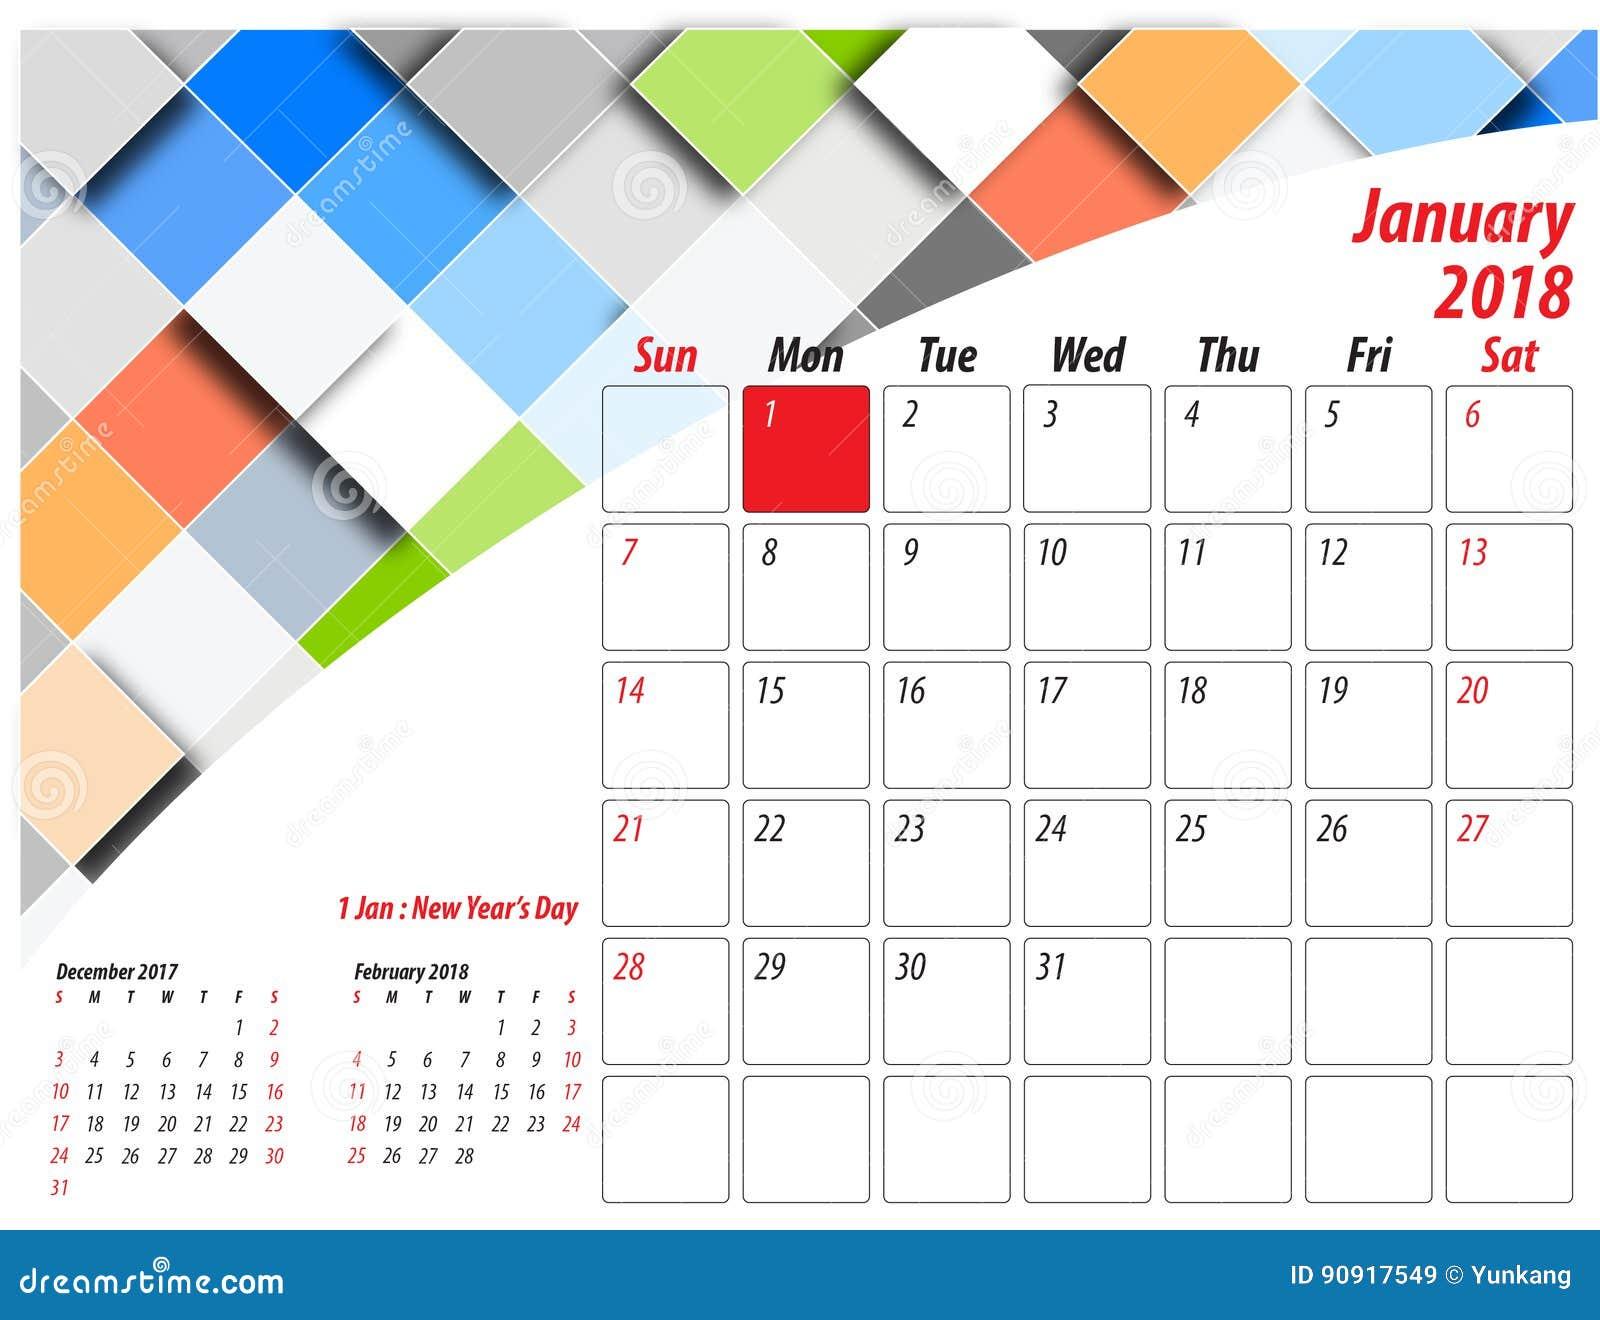 Table Calendar Size : Table calendar stock vector illustration of december